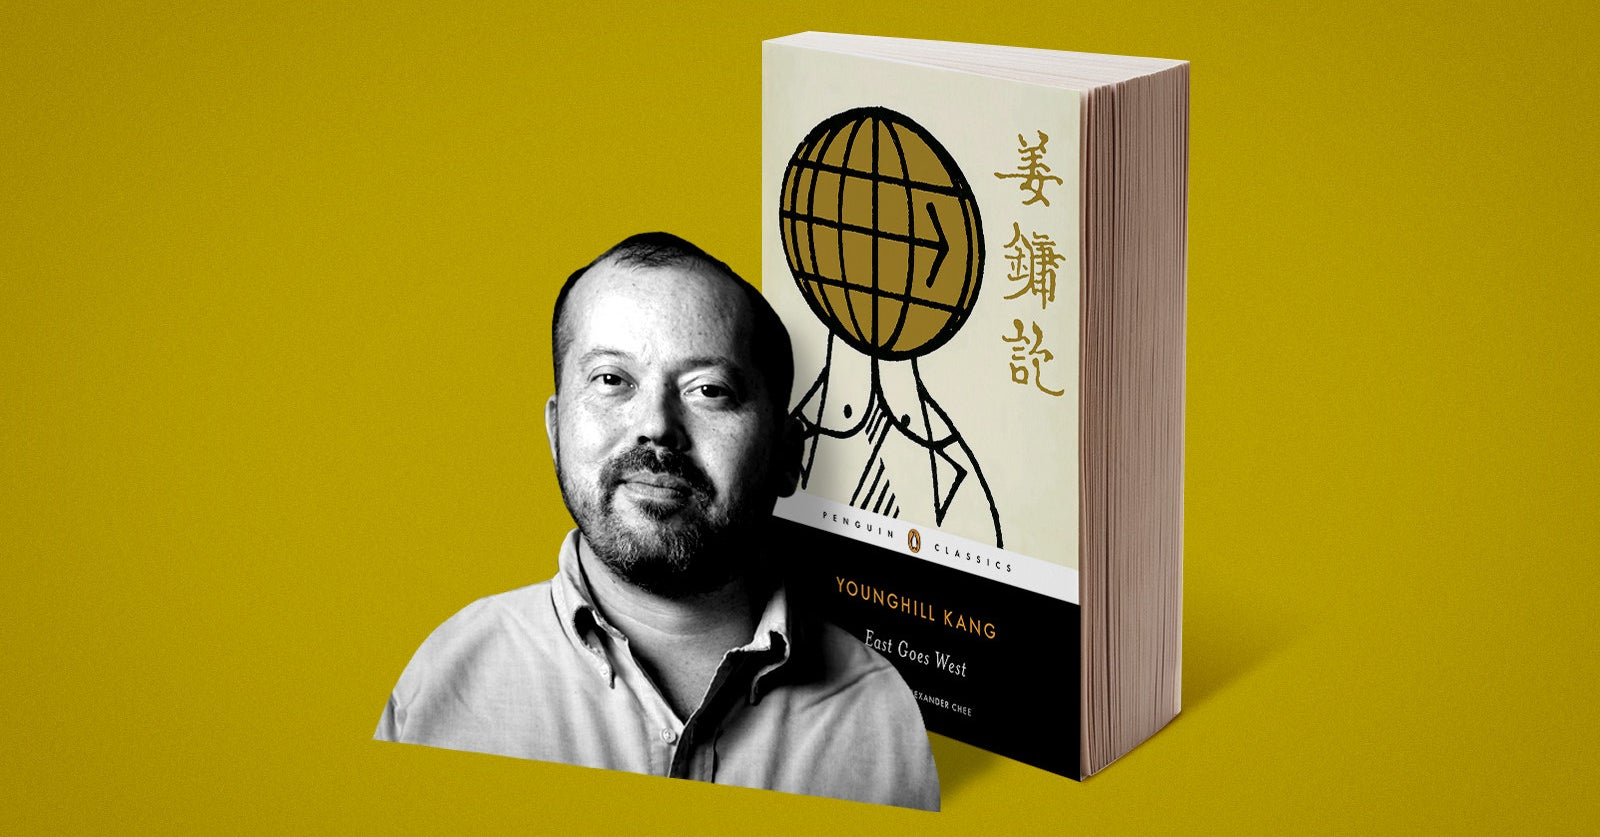 www.buzzfeed.com: Alexander Chee On The Groundbreaking 1937 Novel That